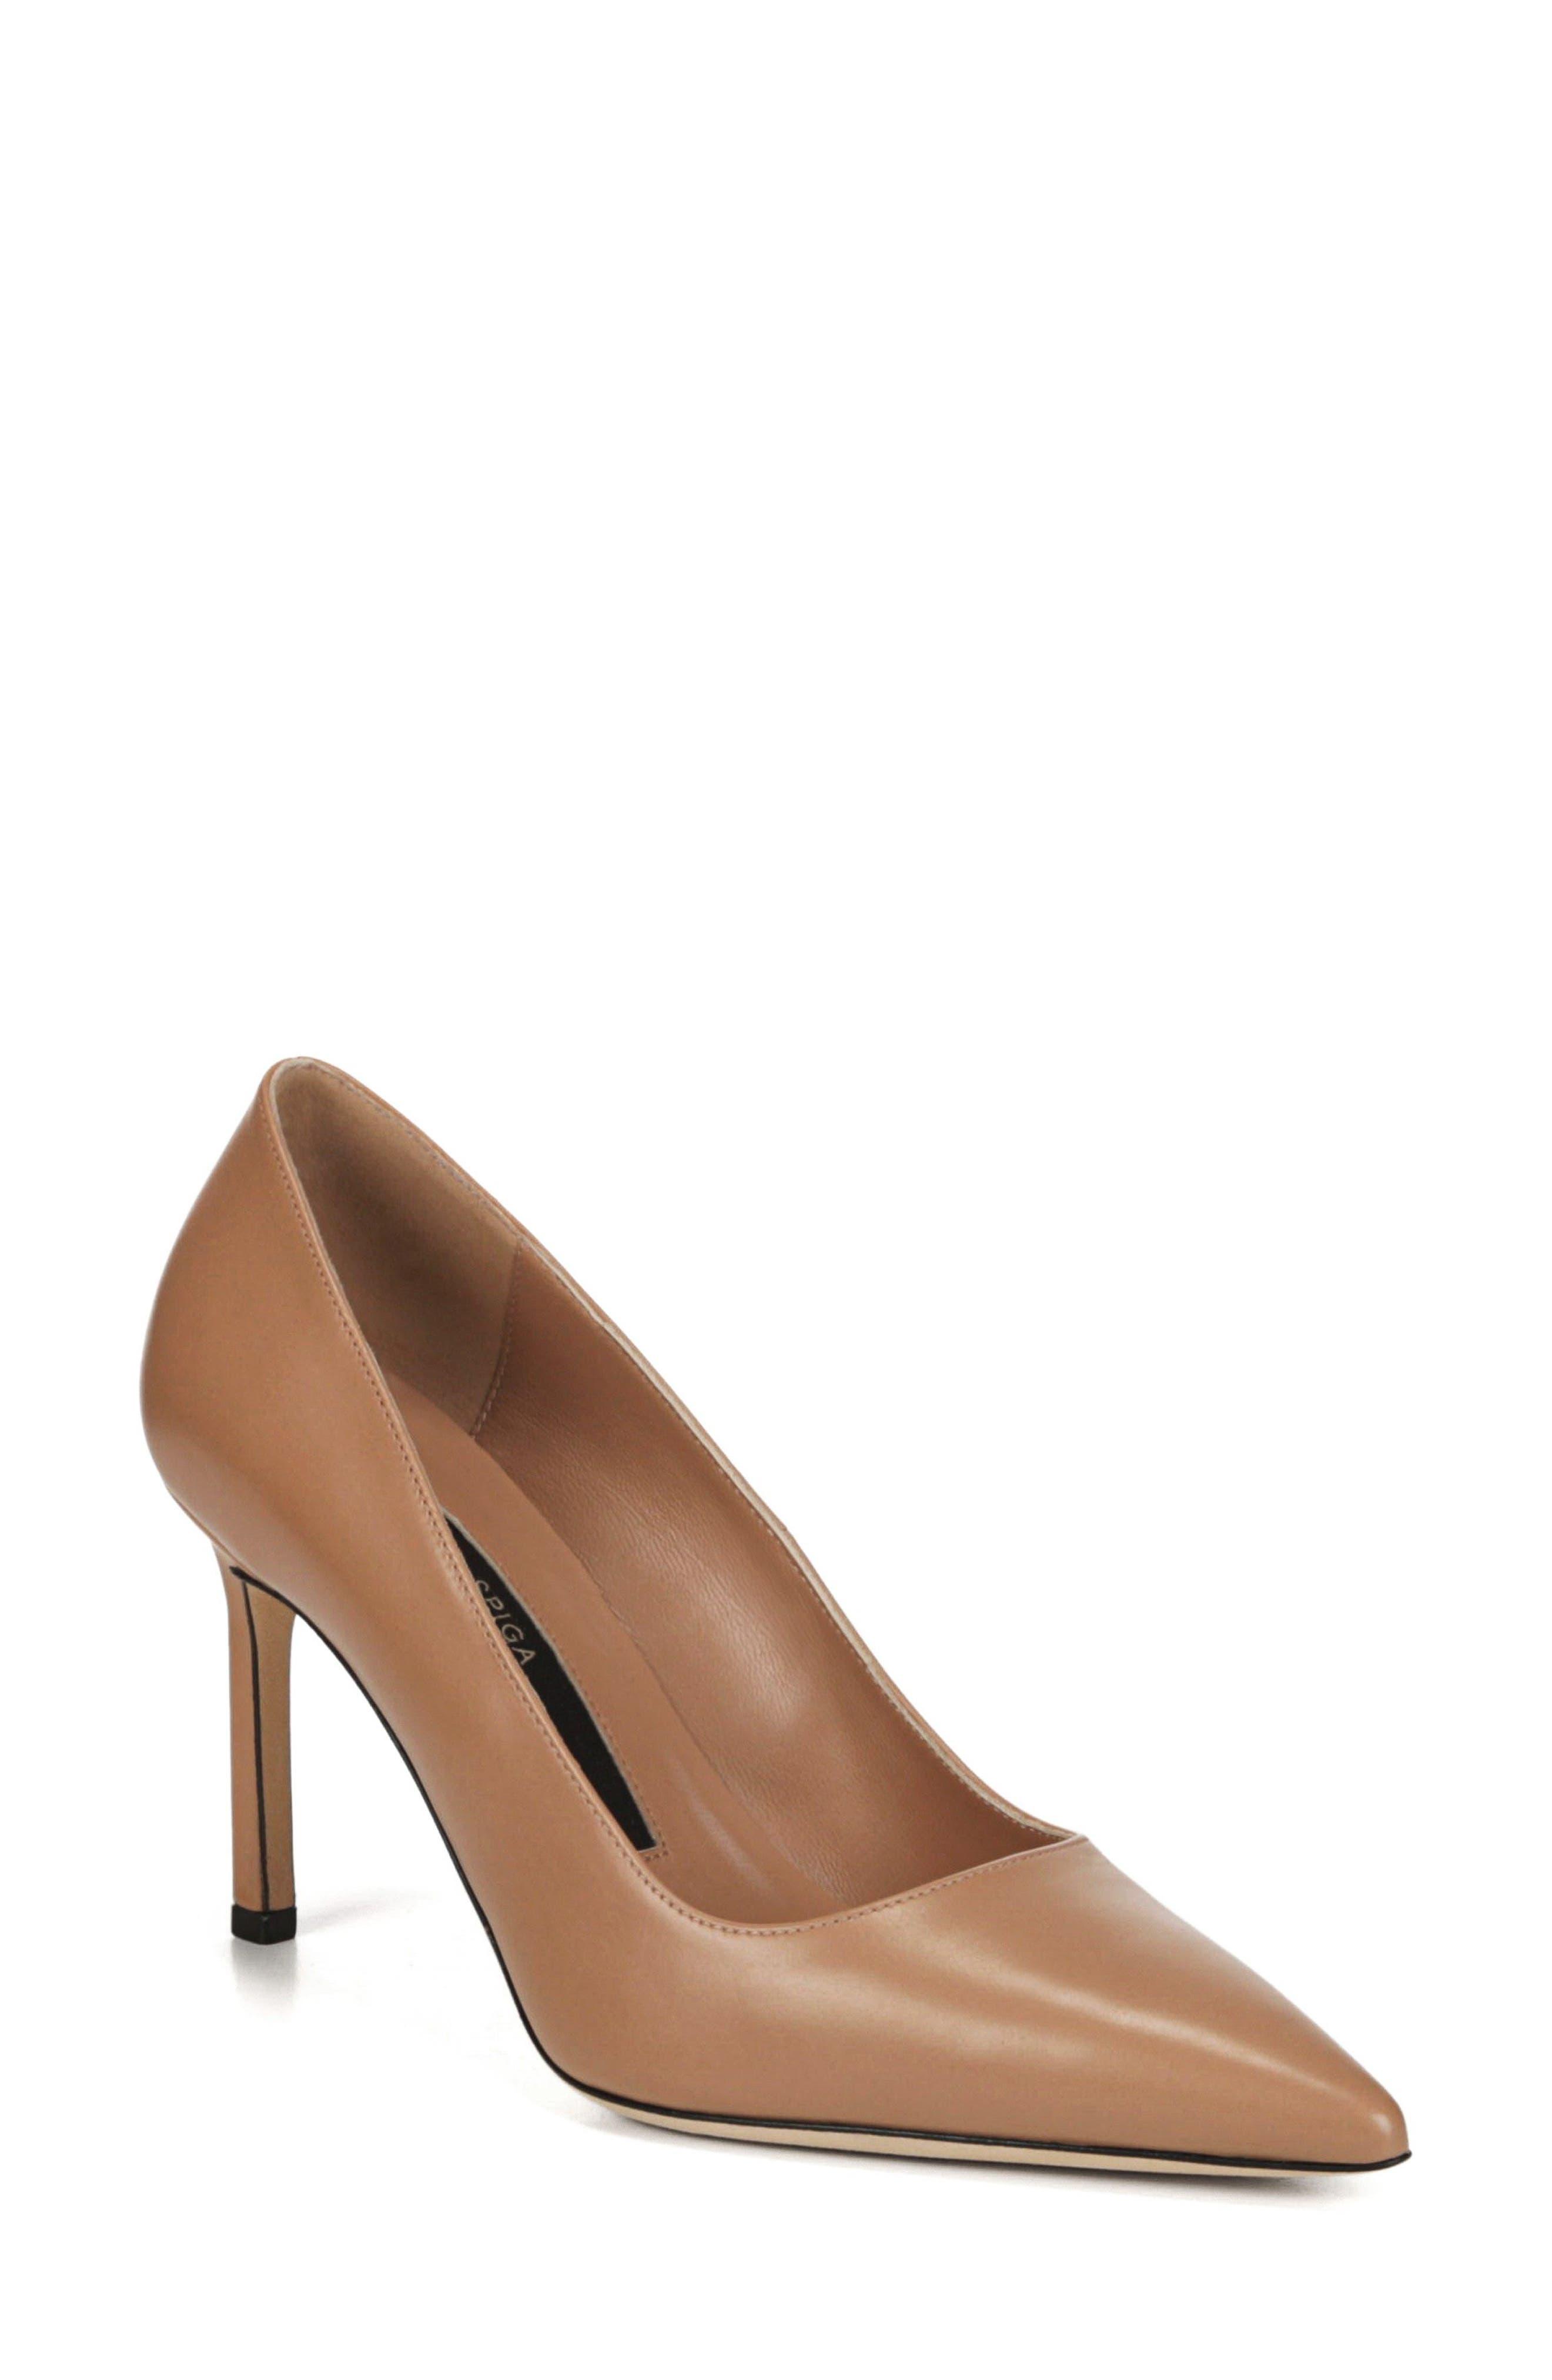 VIA SPIGA Women'S Nikole Leather Pointed Toe High-Heel Pumps in Desert Leather